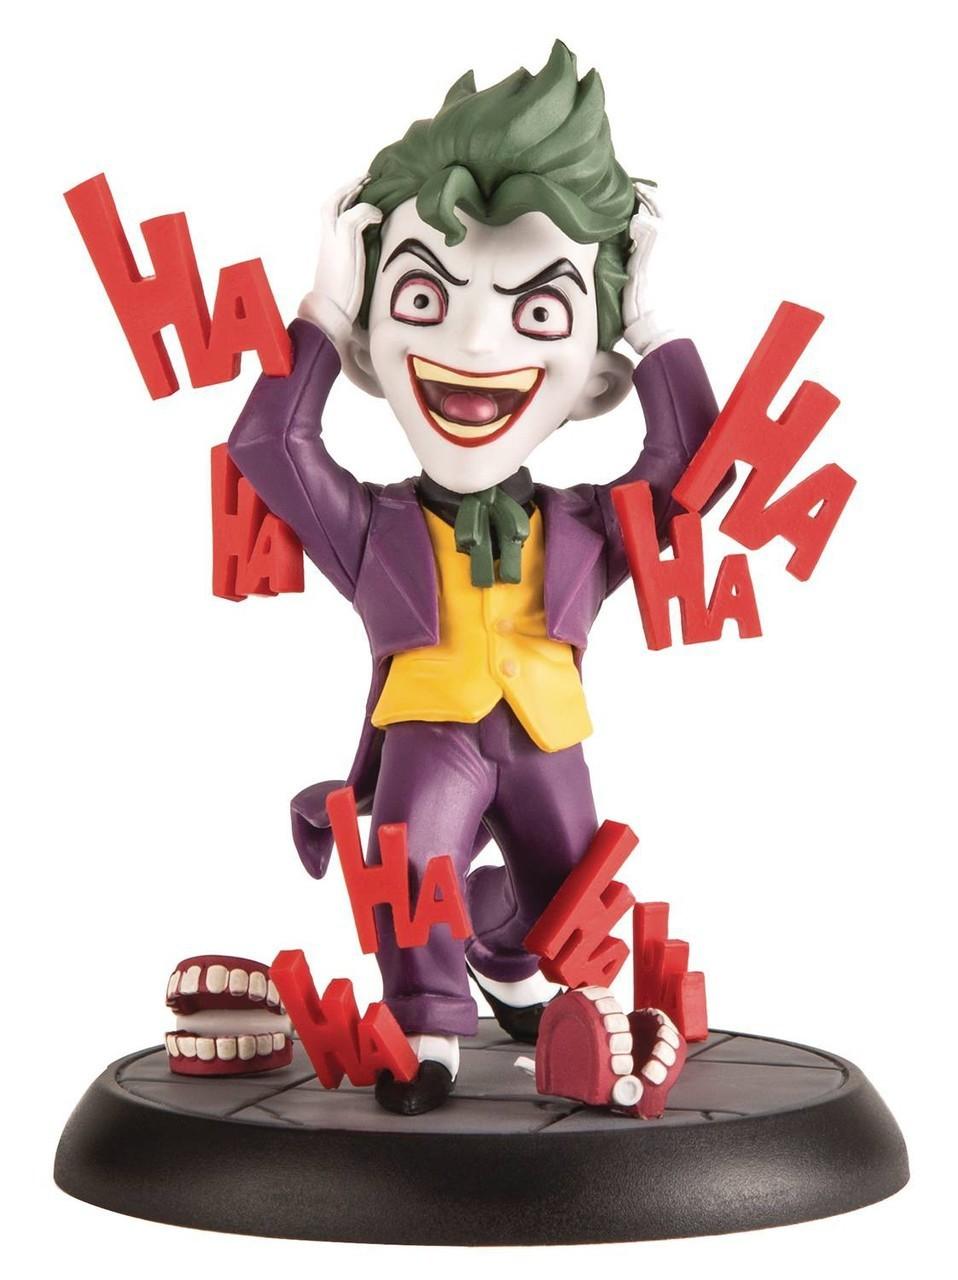 DC COMICS JOKER THE KILLING JOKE Q-FIG statulėlė | 10cm